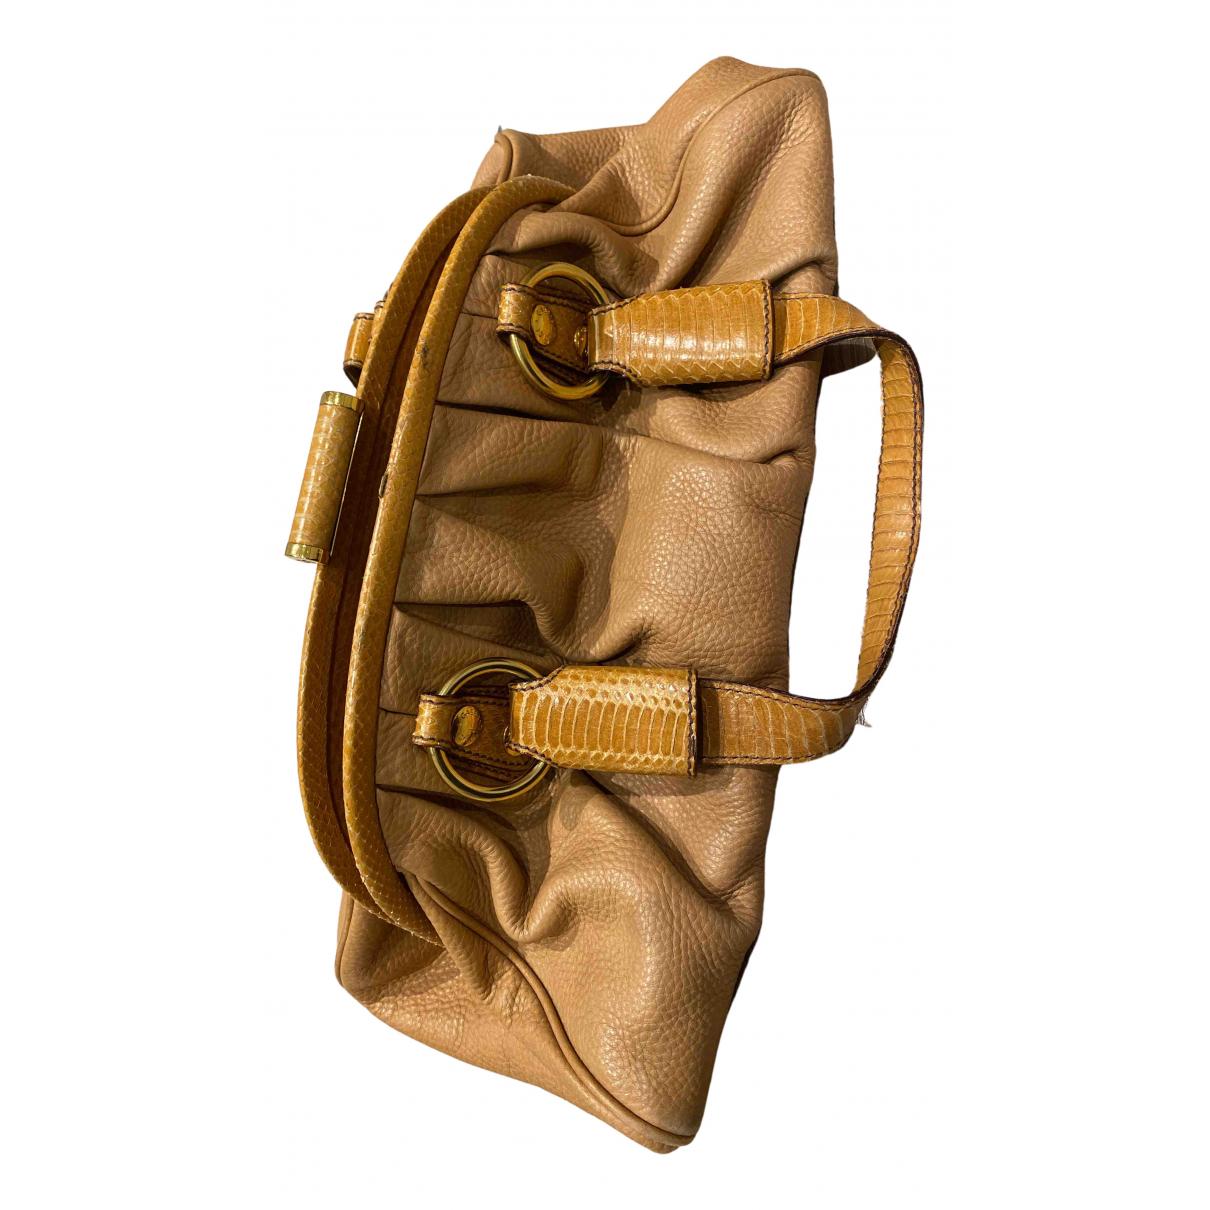 Dolce & Gabbana N Beige Python handbag for Women N